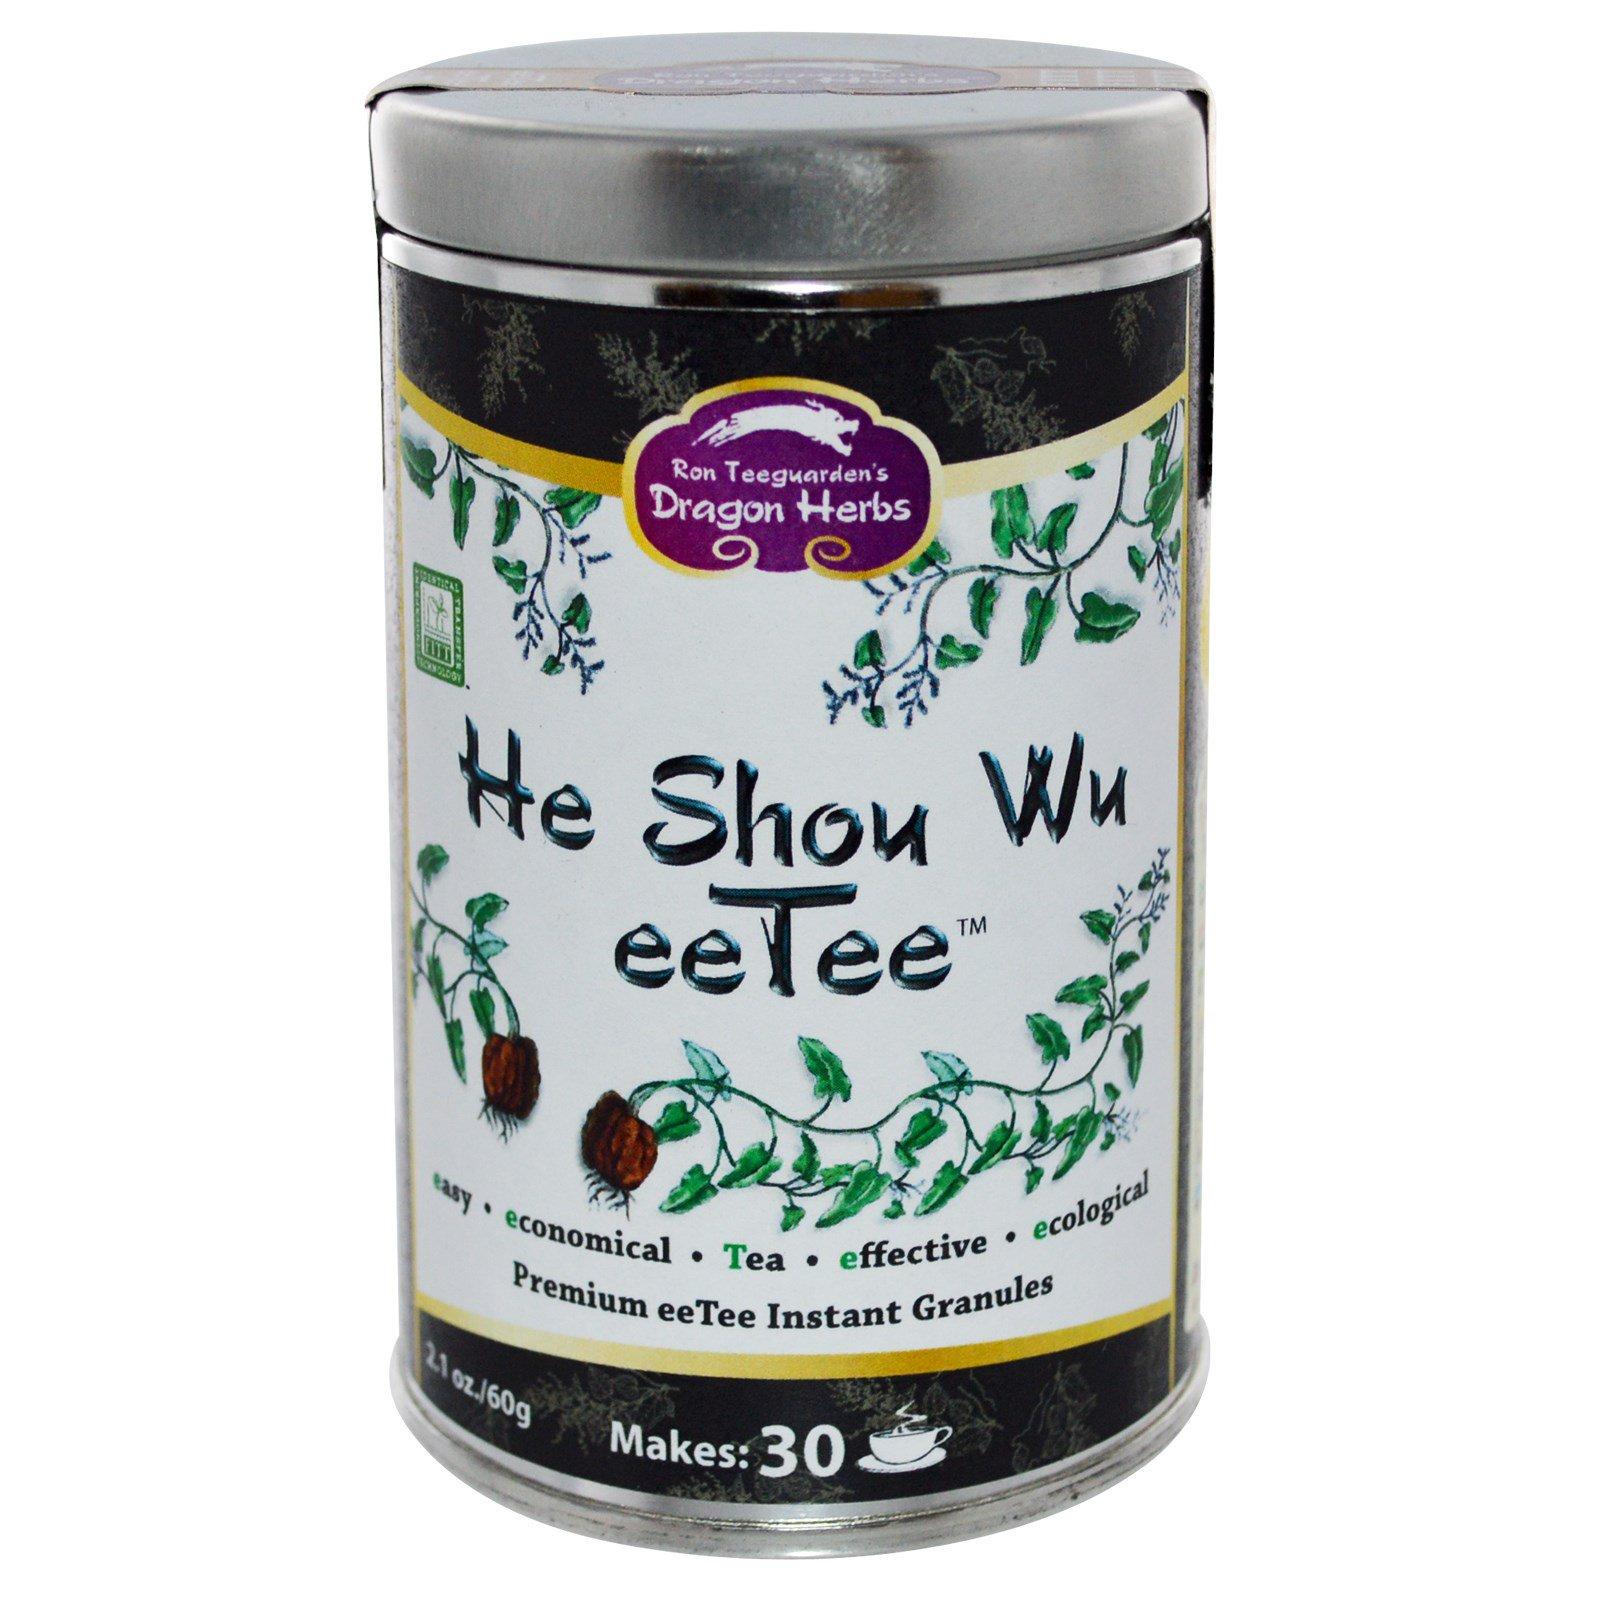 Dragon Herbs, Хи-Шу-Ву, eeTee, 2,1 унции (60 г)